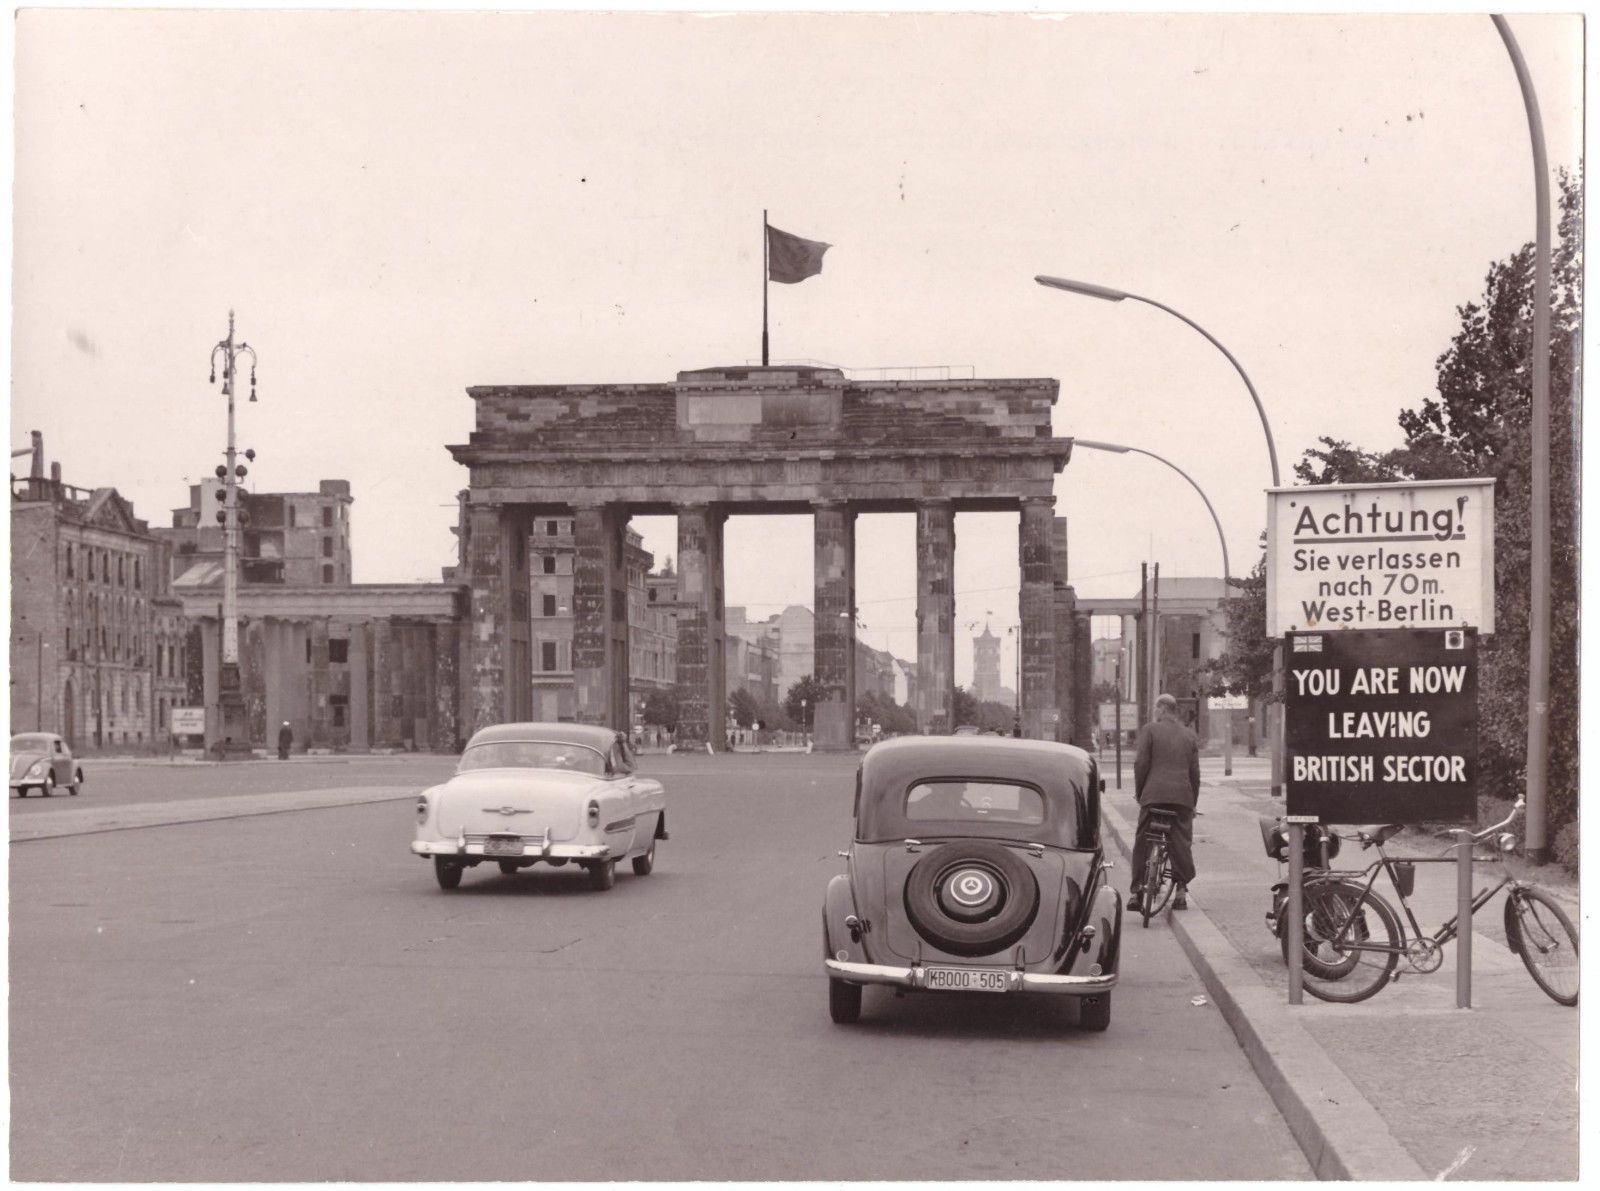 Berlin Um 1948 You Are Leaving British Sector Ruinen Brandenburger Tor Kalter Krieg